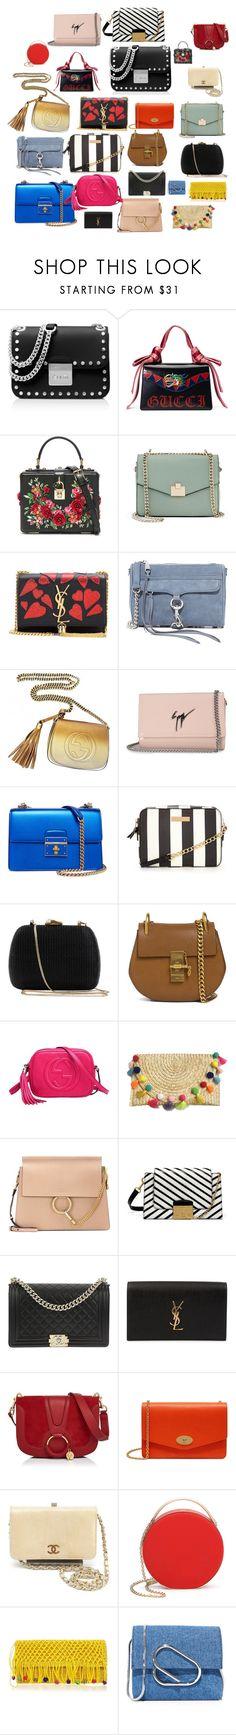 Ideas about Mini Bags by nadinezvous on Polyvore featuring mode, MICHAEL Michael Kors, Dolce&Gabbana, Gucci, Mulberry, Yves Saint Laurent, Giuseppe Zanotti, Rebecca Minkoff, Jennifer Lopez and Chloé